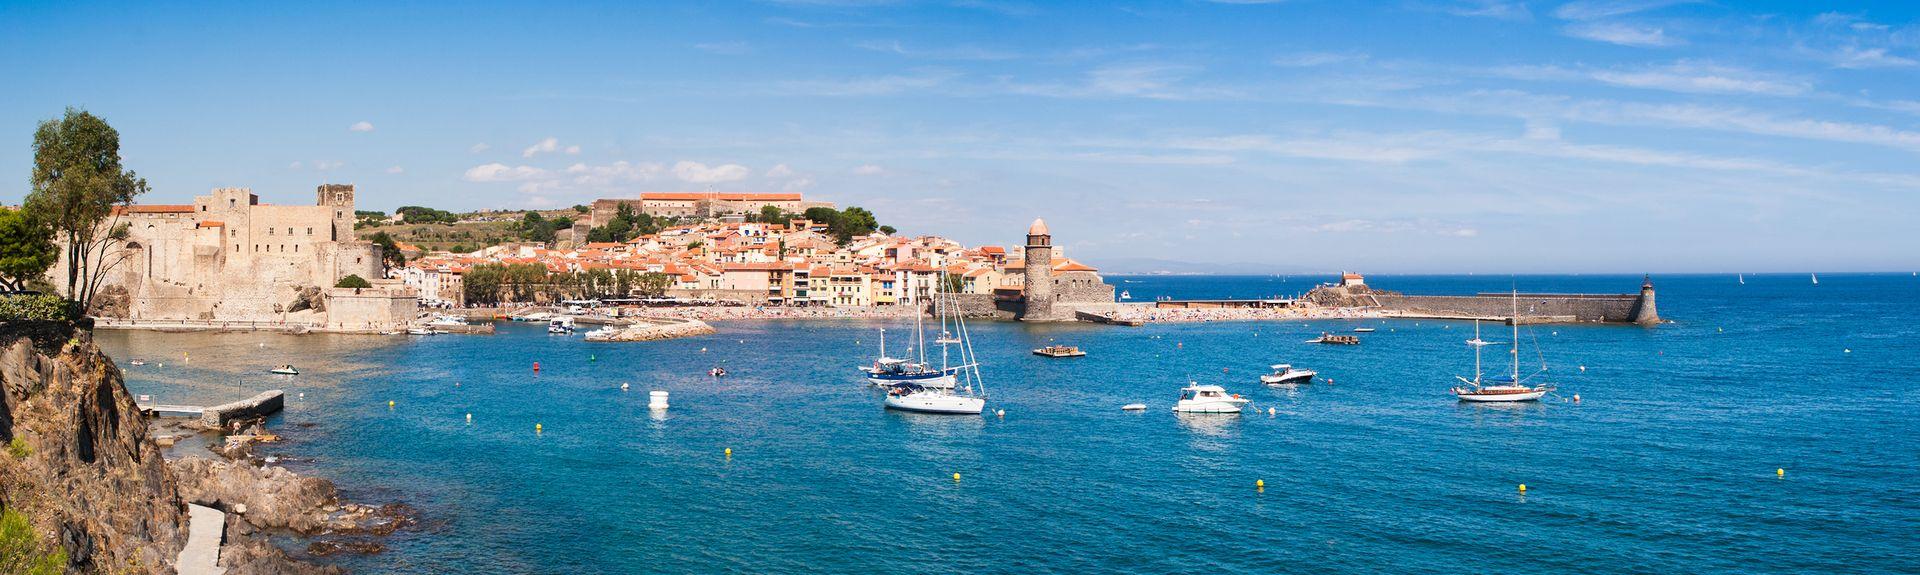 Collioure, Occitanie, Frankreich